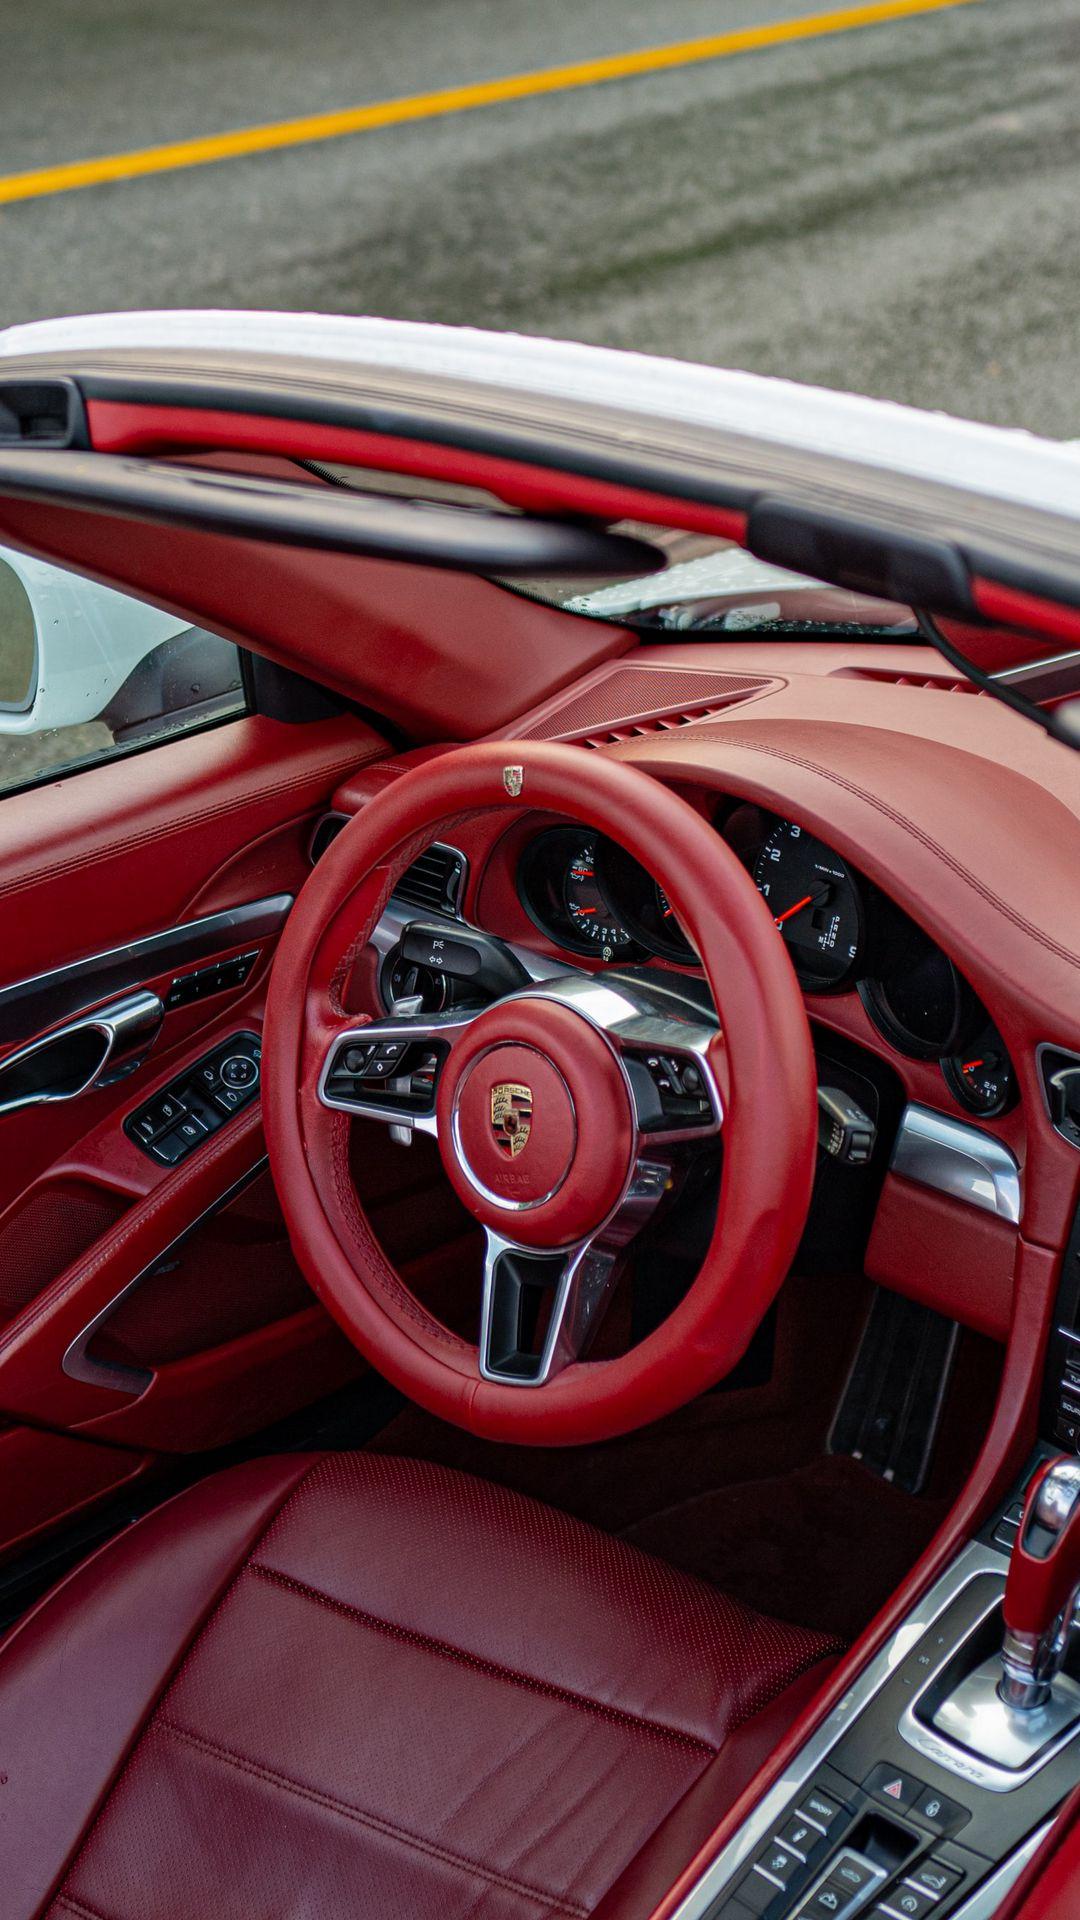 Porsche Steering Wheel Red Decor Background Wallpapers